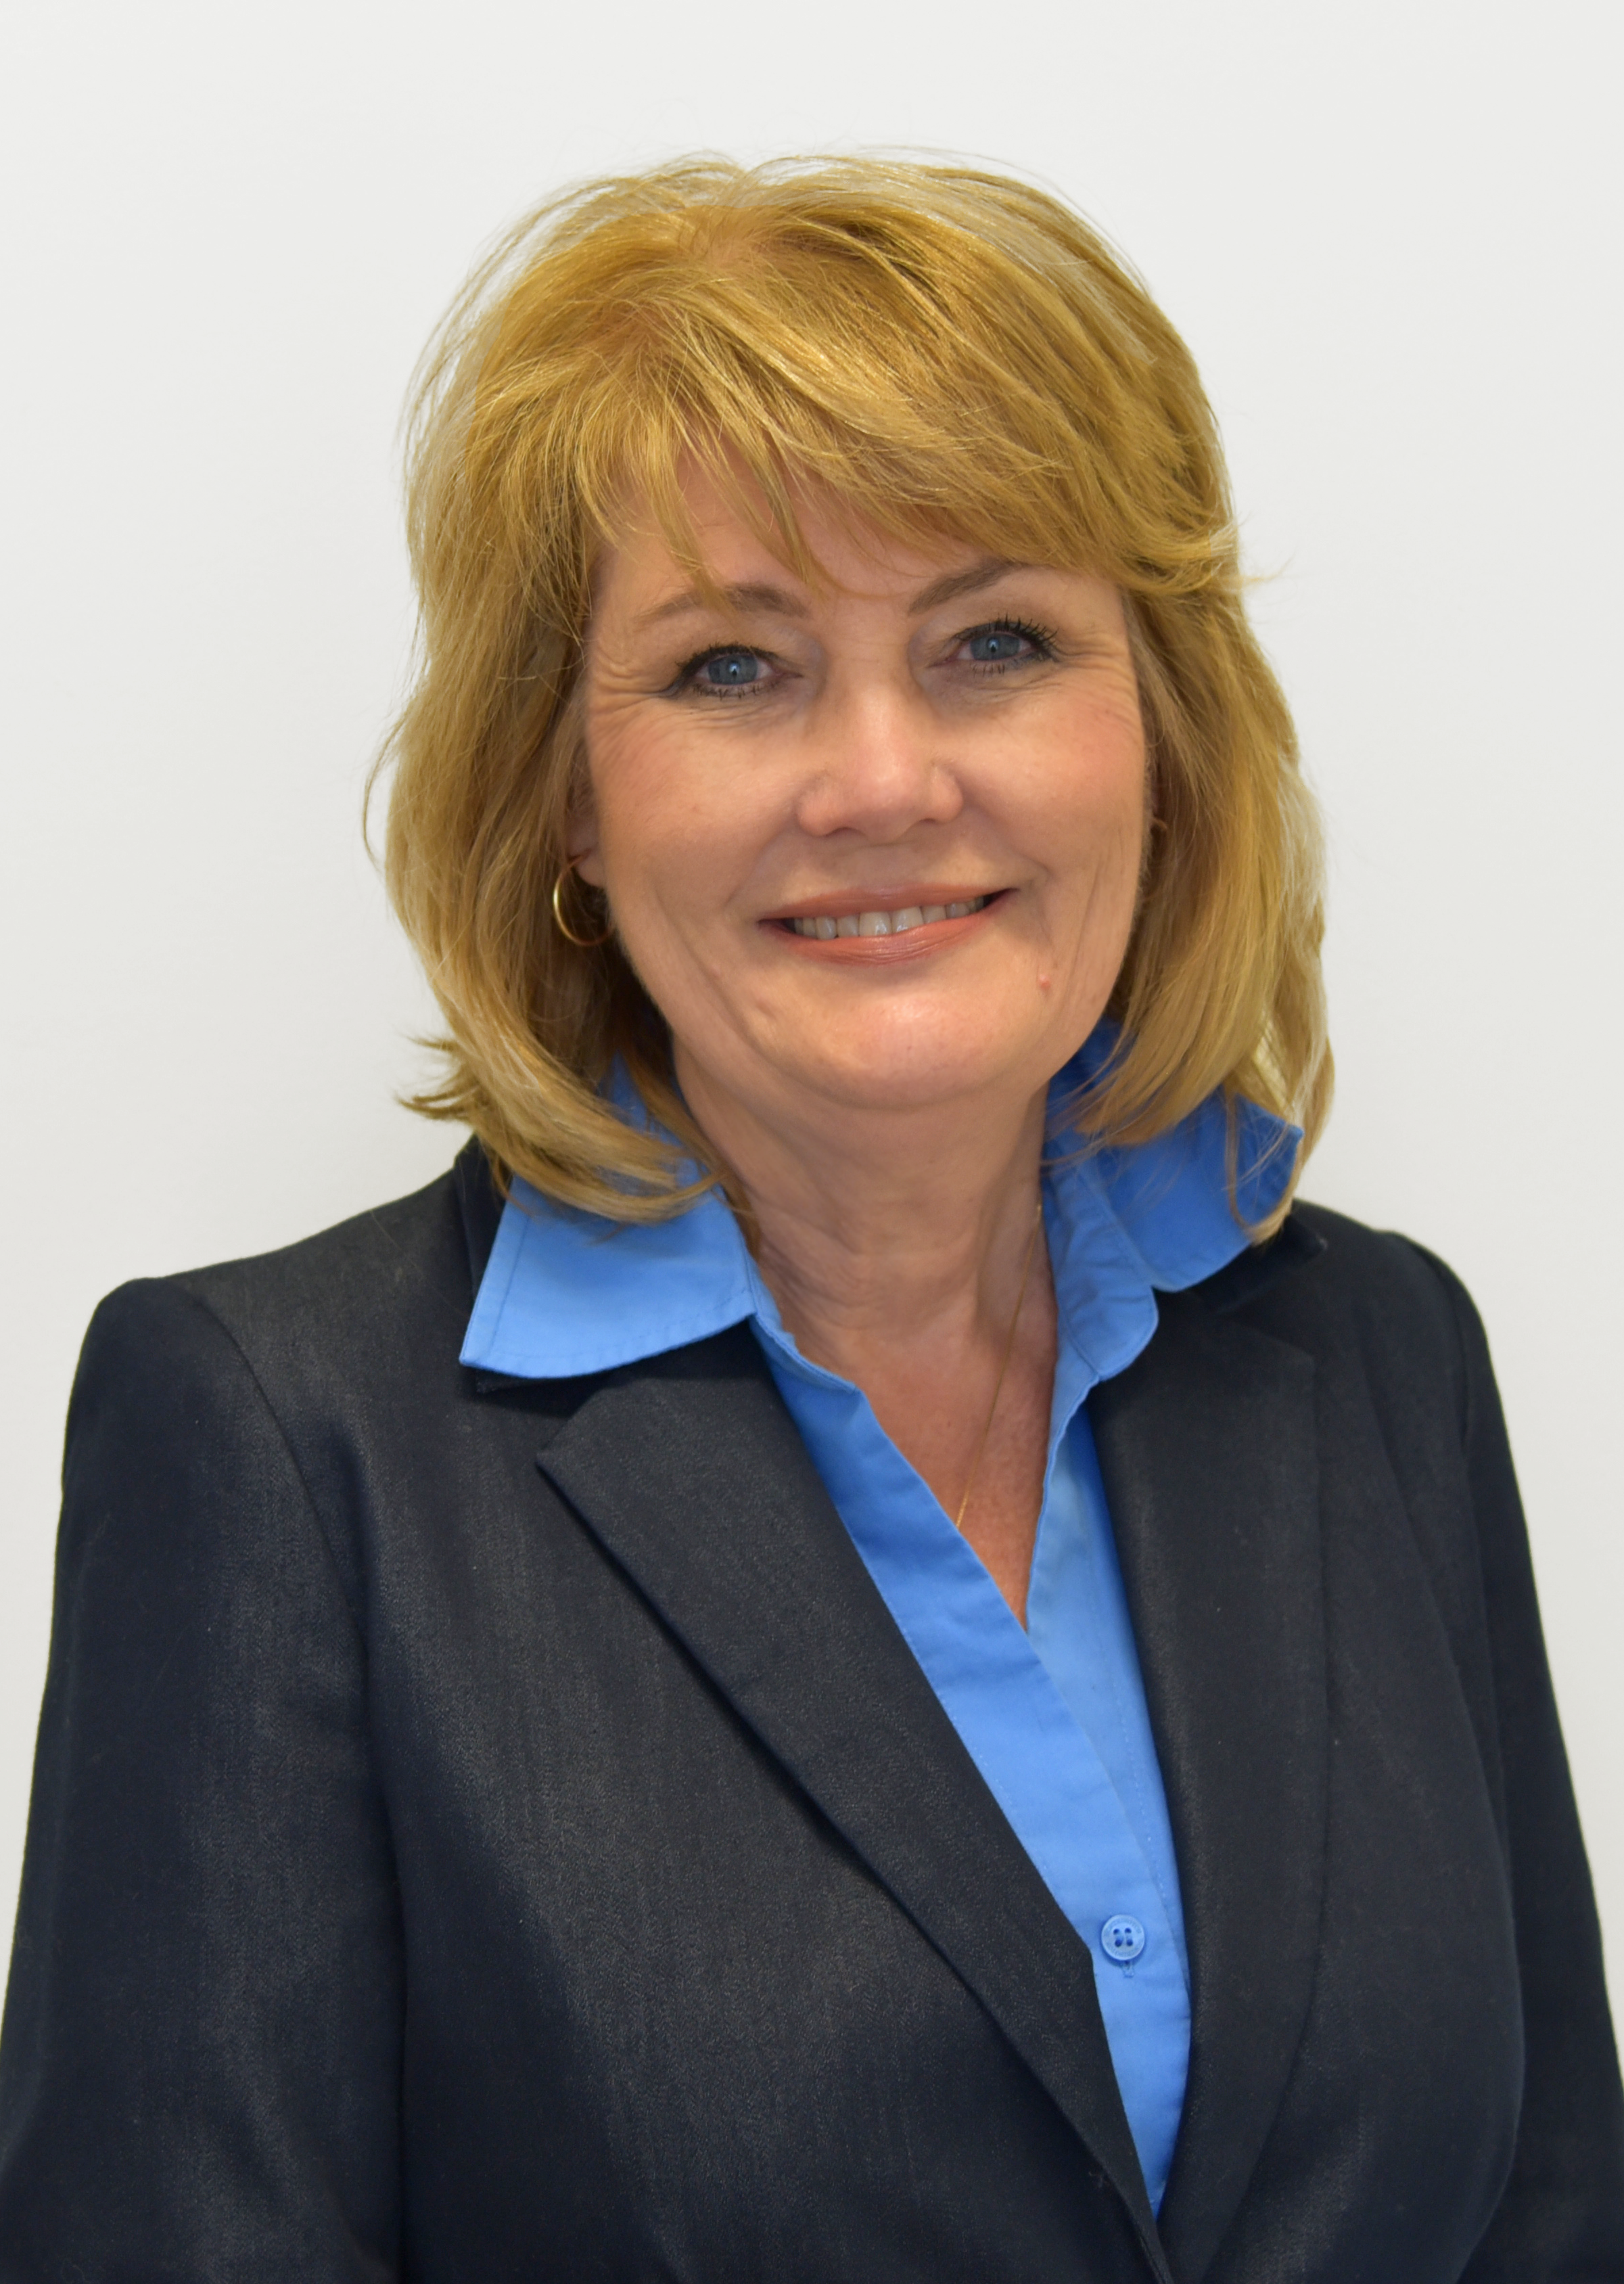 Kathy Barber : Economic Development Specialist, CIS